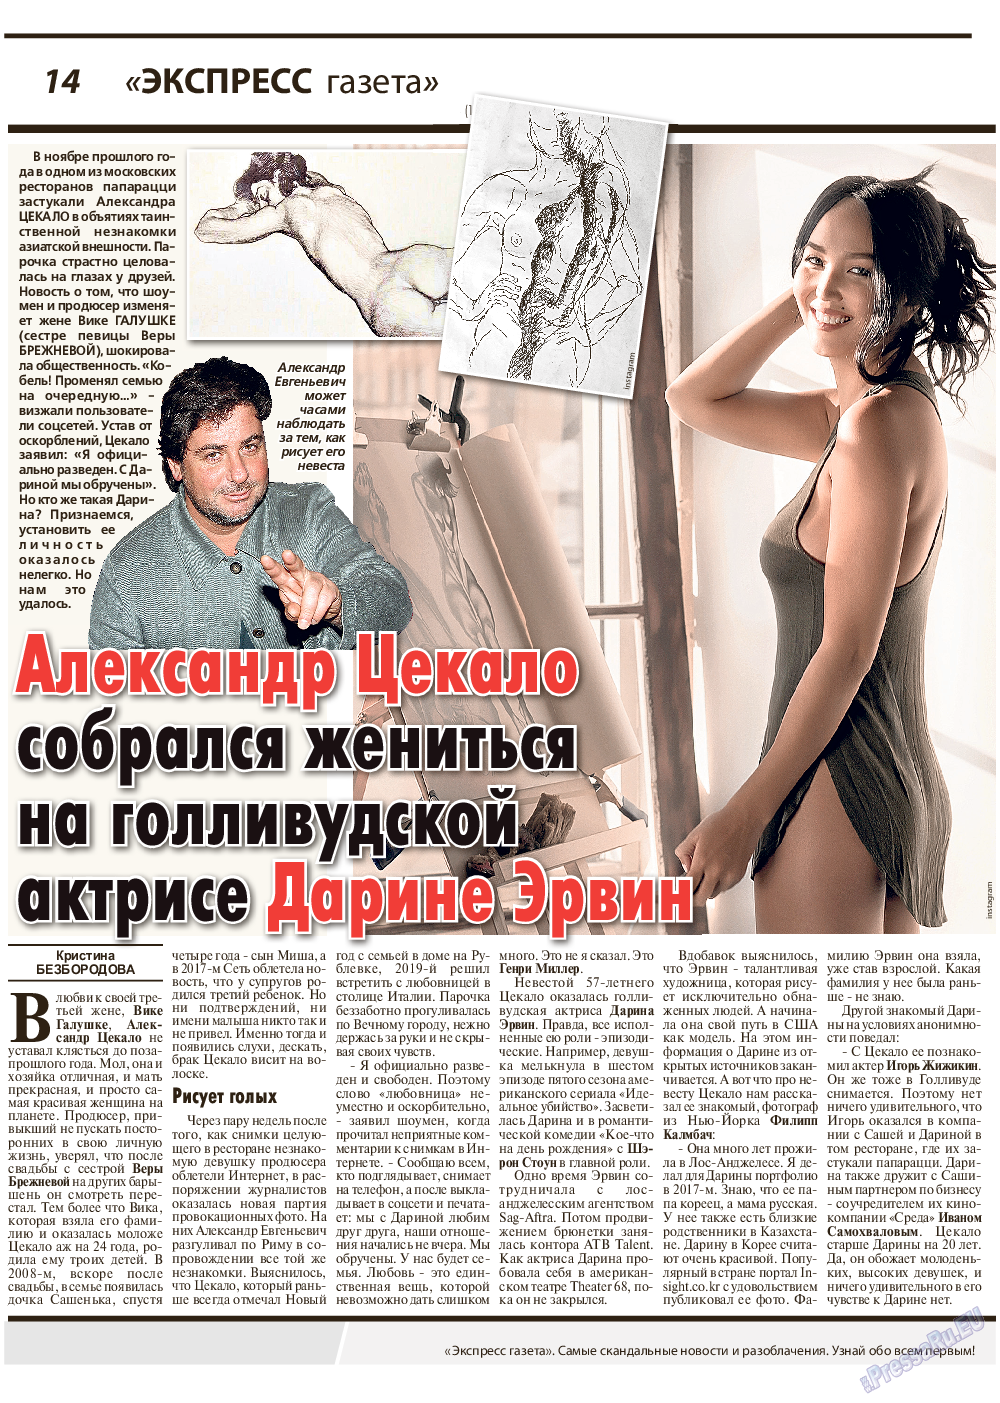 Экспресс газета (газета). 2019 год, номер 3, стр. 14